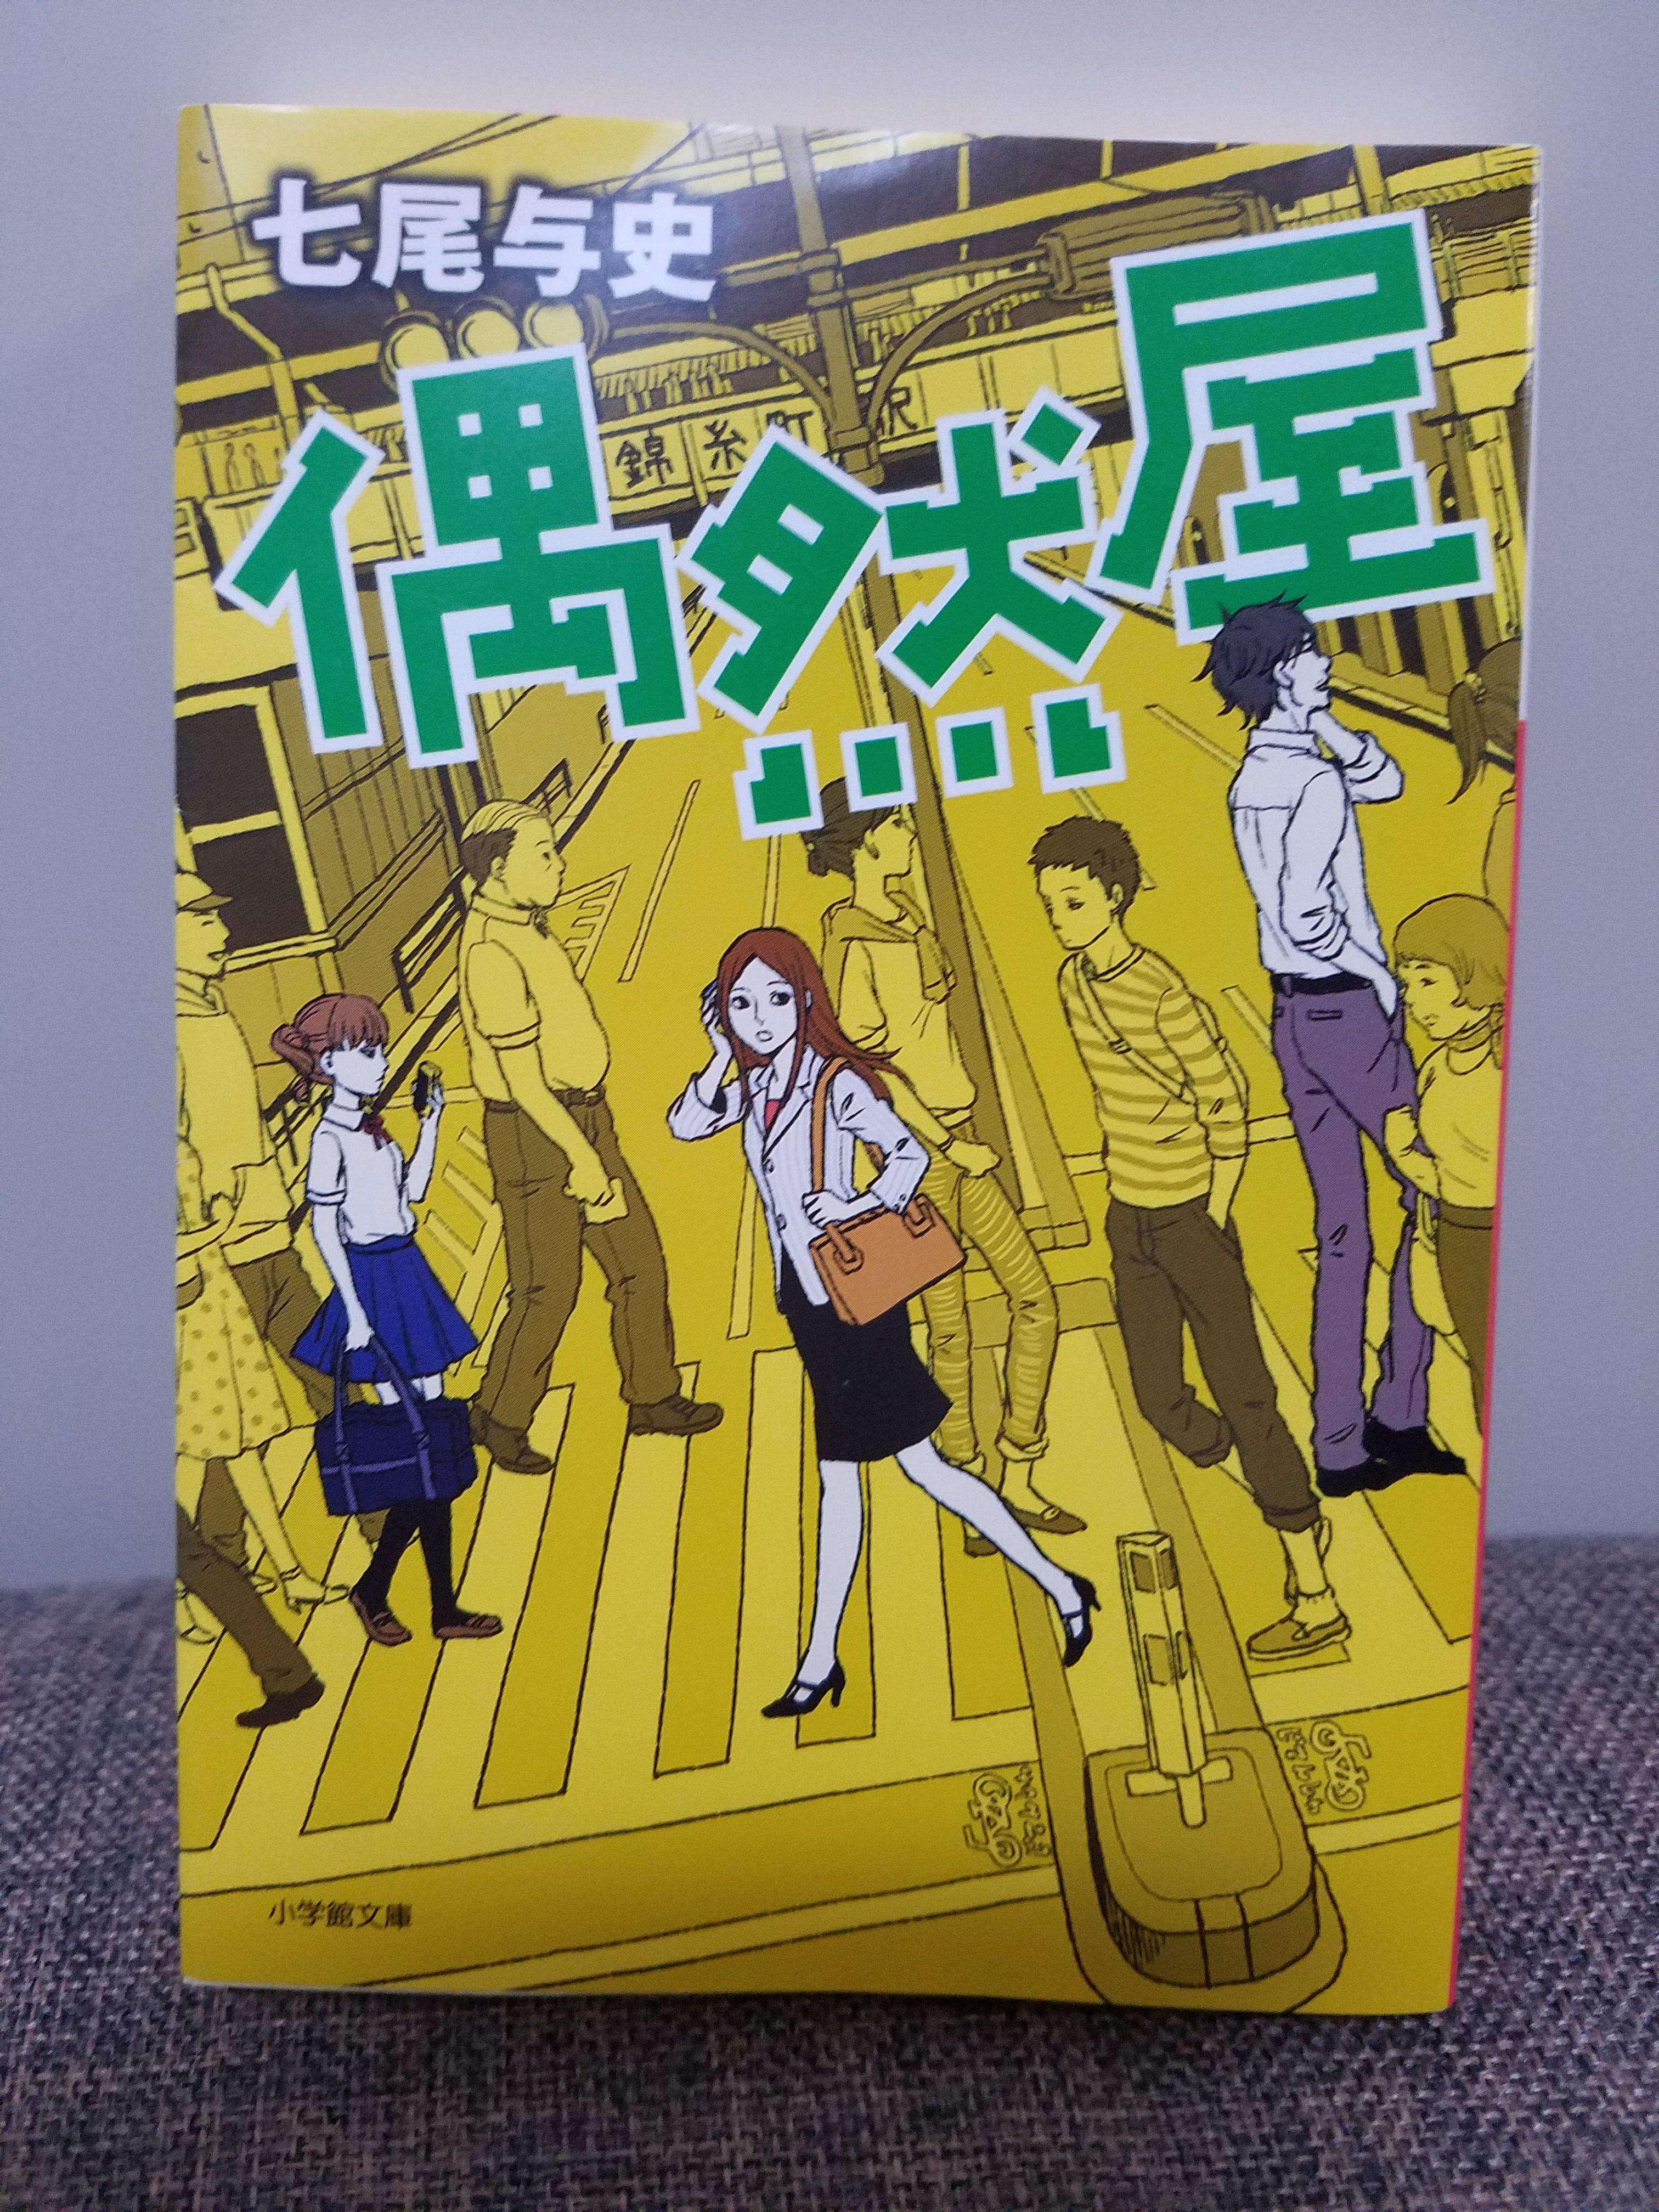 七尾与史『偶然屋』感想※ネタバレ注意(素人小説書評)